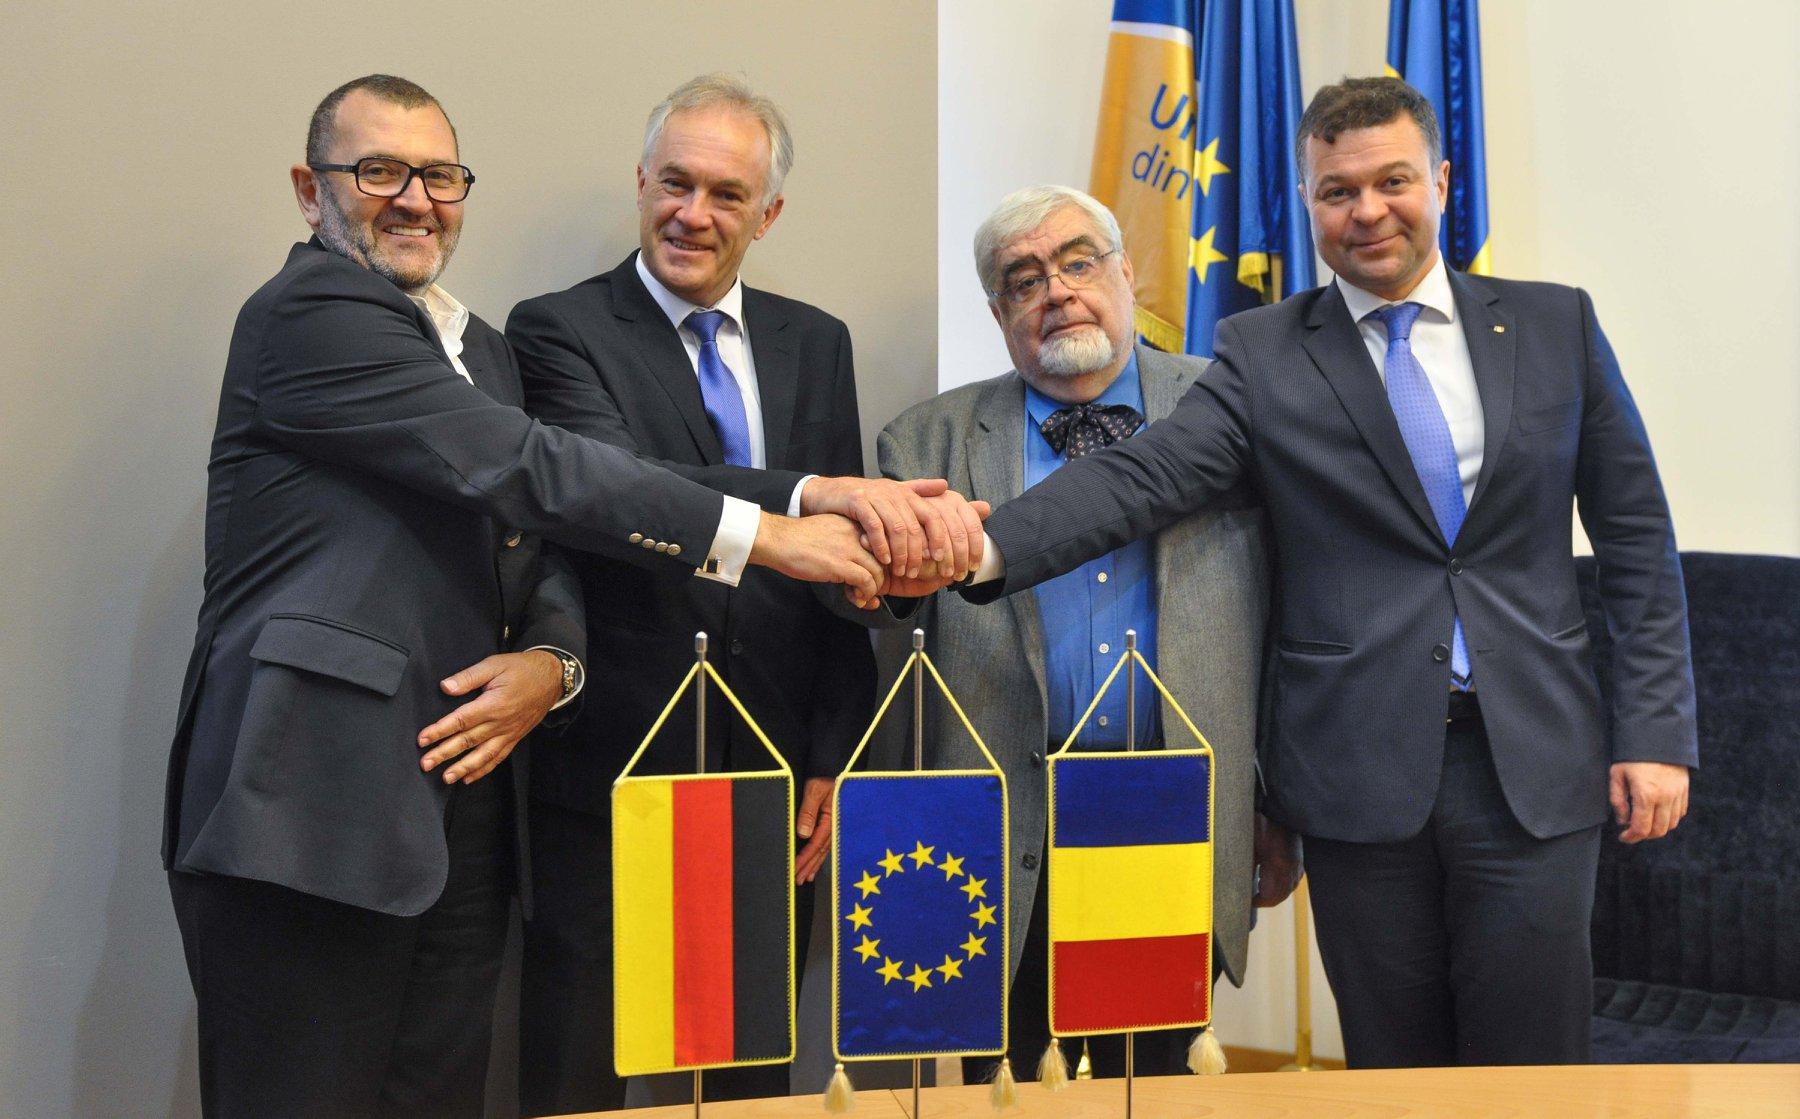 https://i2.wp.com/www.justitiarul.ro/wp-content/uploads/2018/05/univ-de-vest-germania.jpg